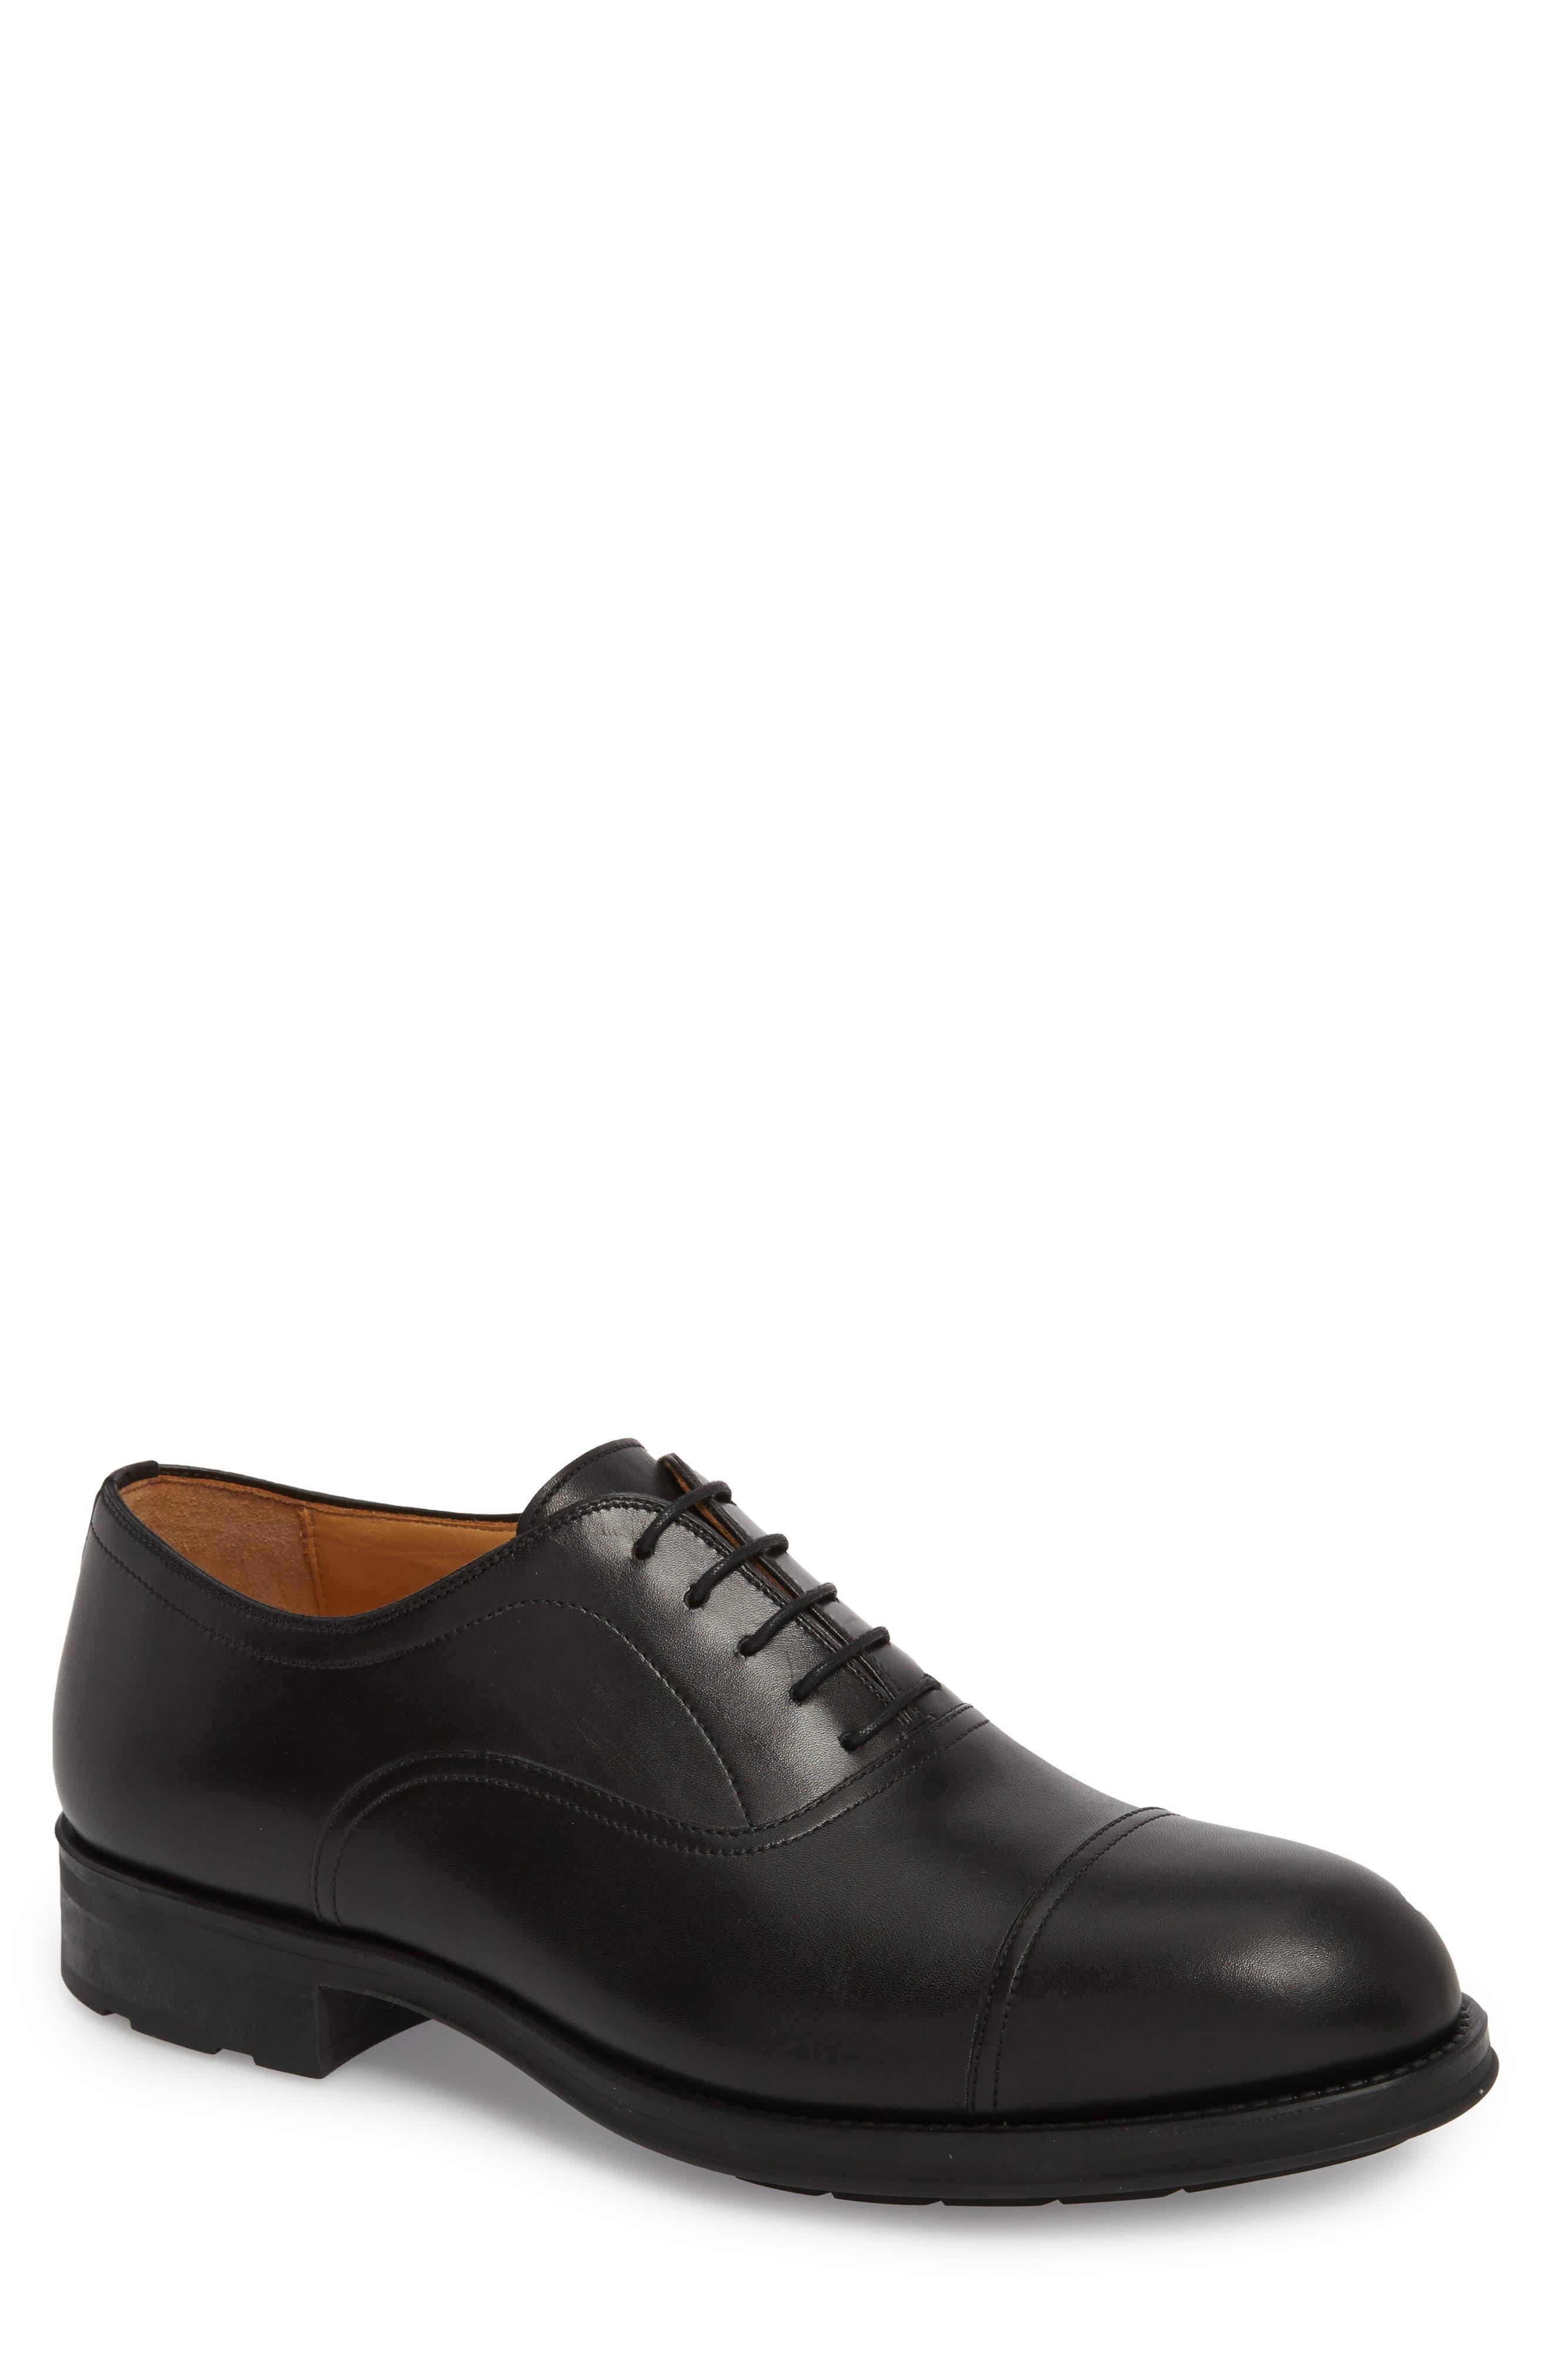 Tadeo Cap Toe Oxford,                         Main,                         color, Black Leather